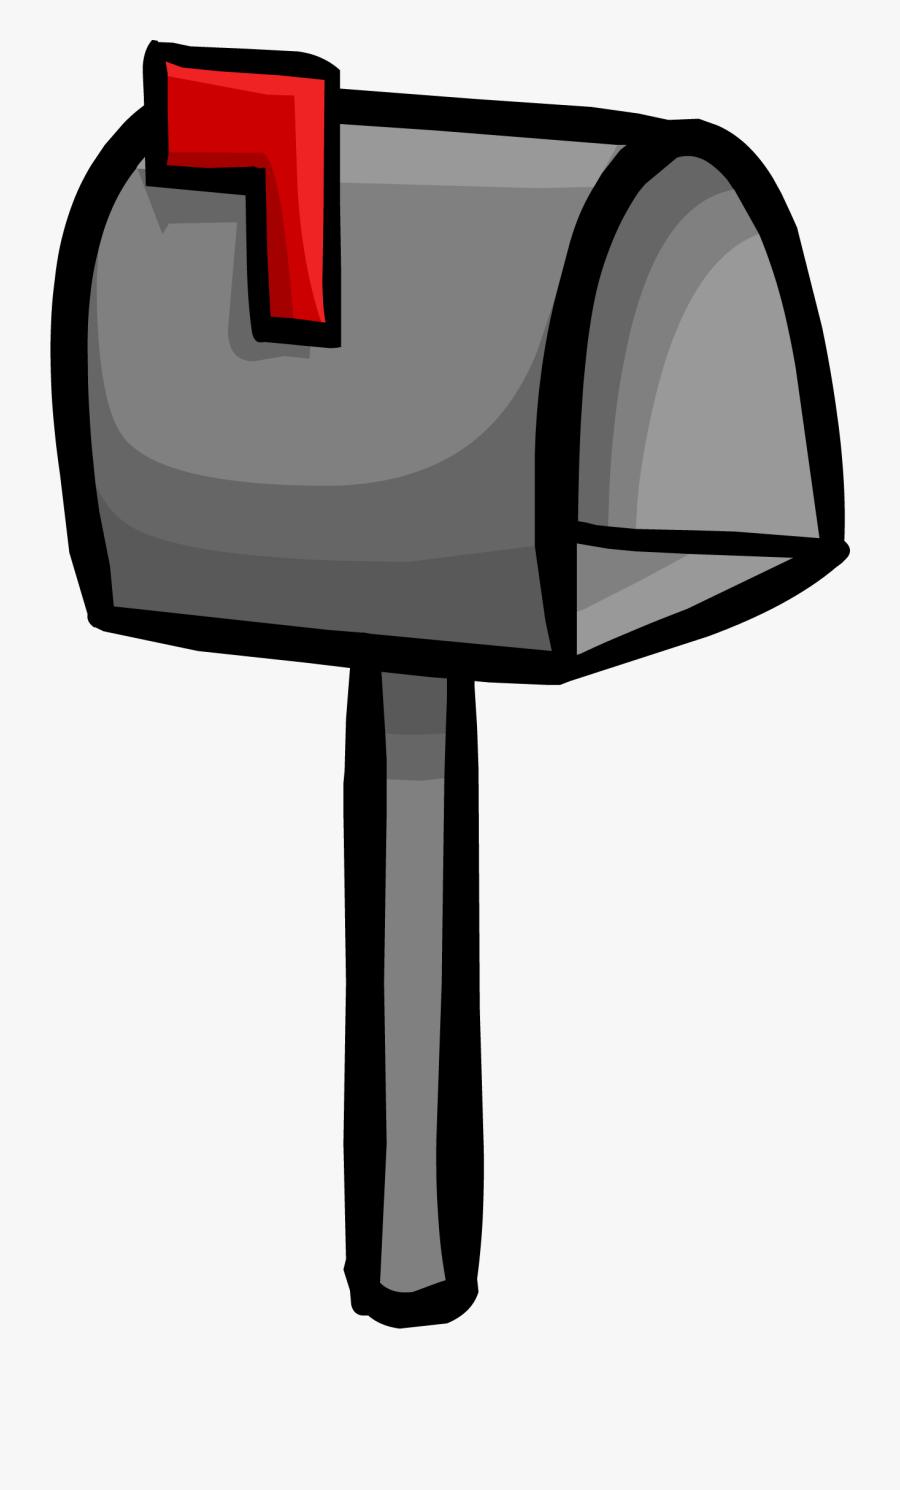 Image - Transparent Background Mailbox Clipart, Transparent Clipart